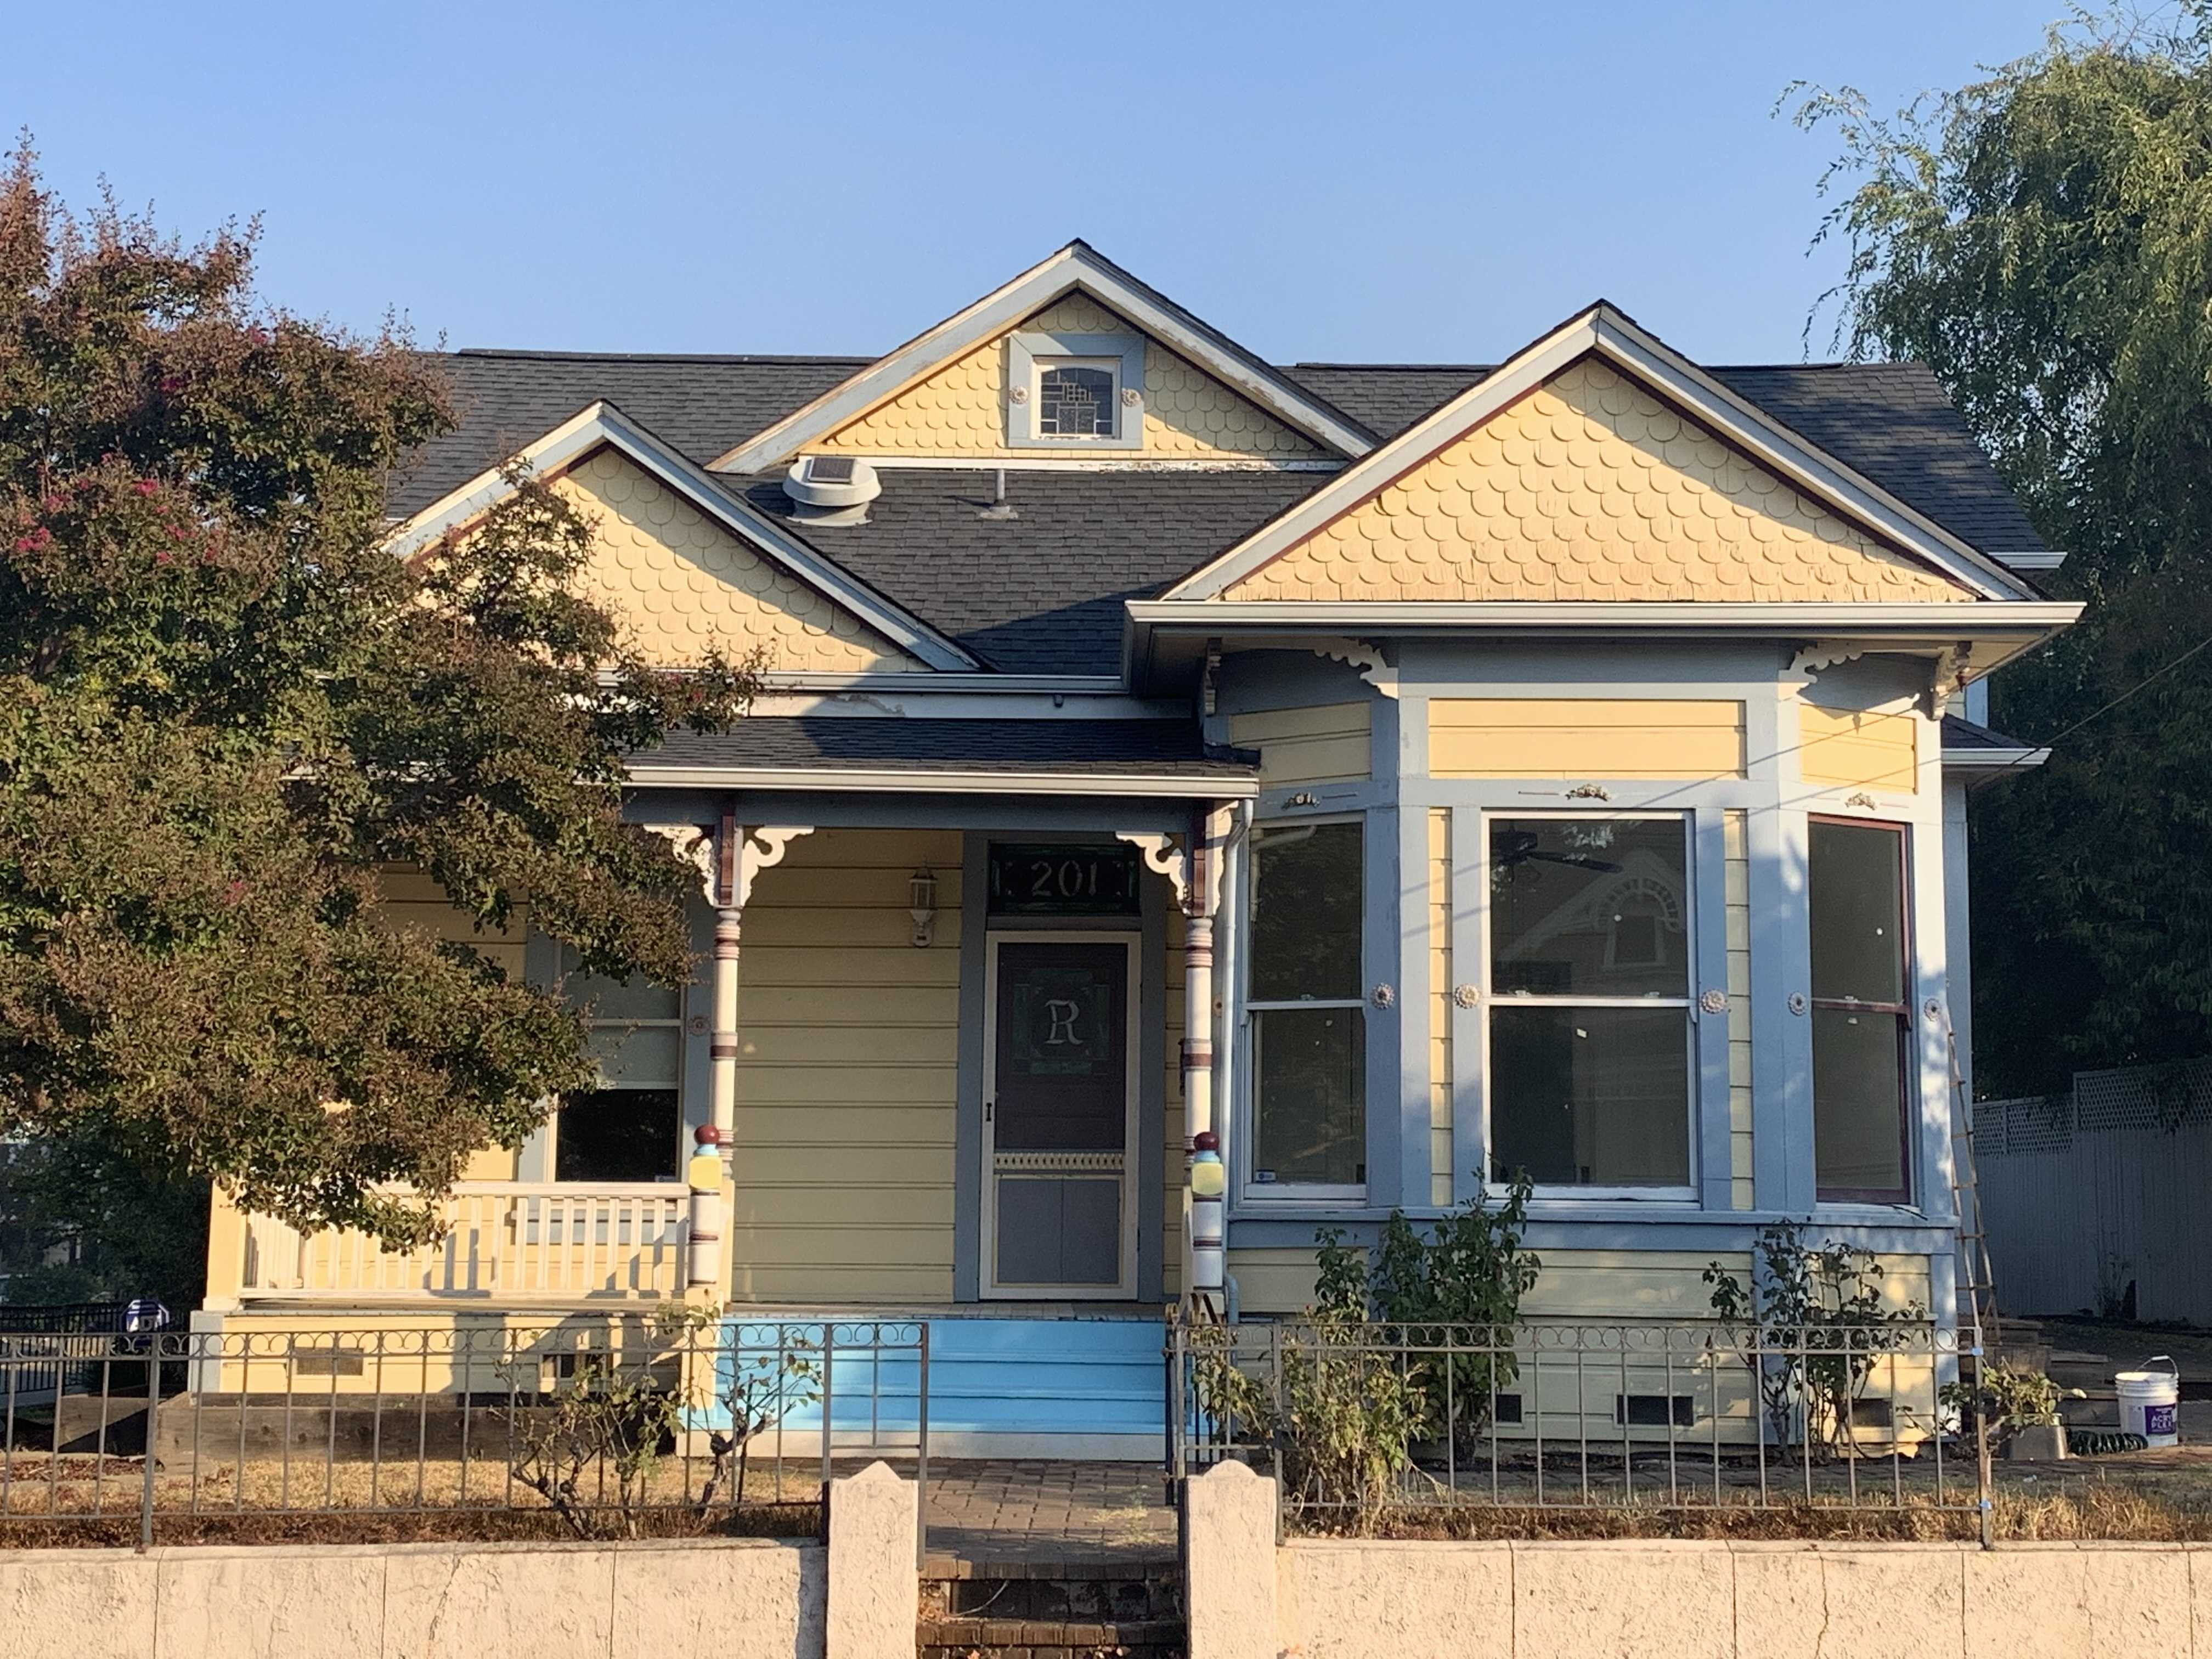 201 Piper Street, Healdsburg, CA, 95448